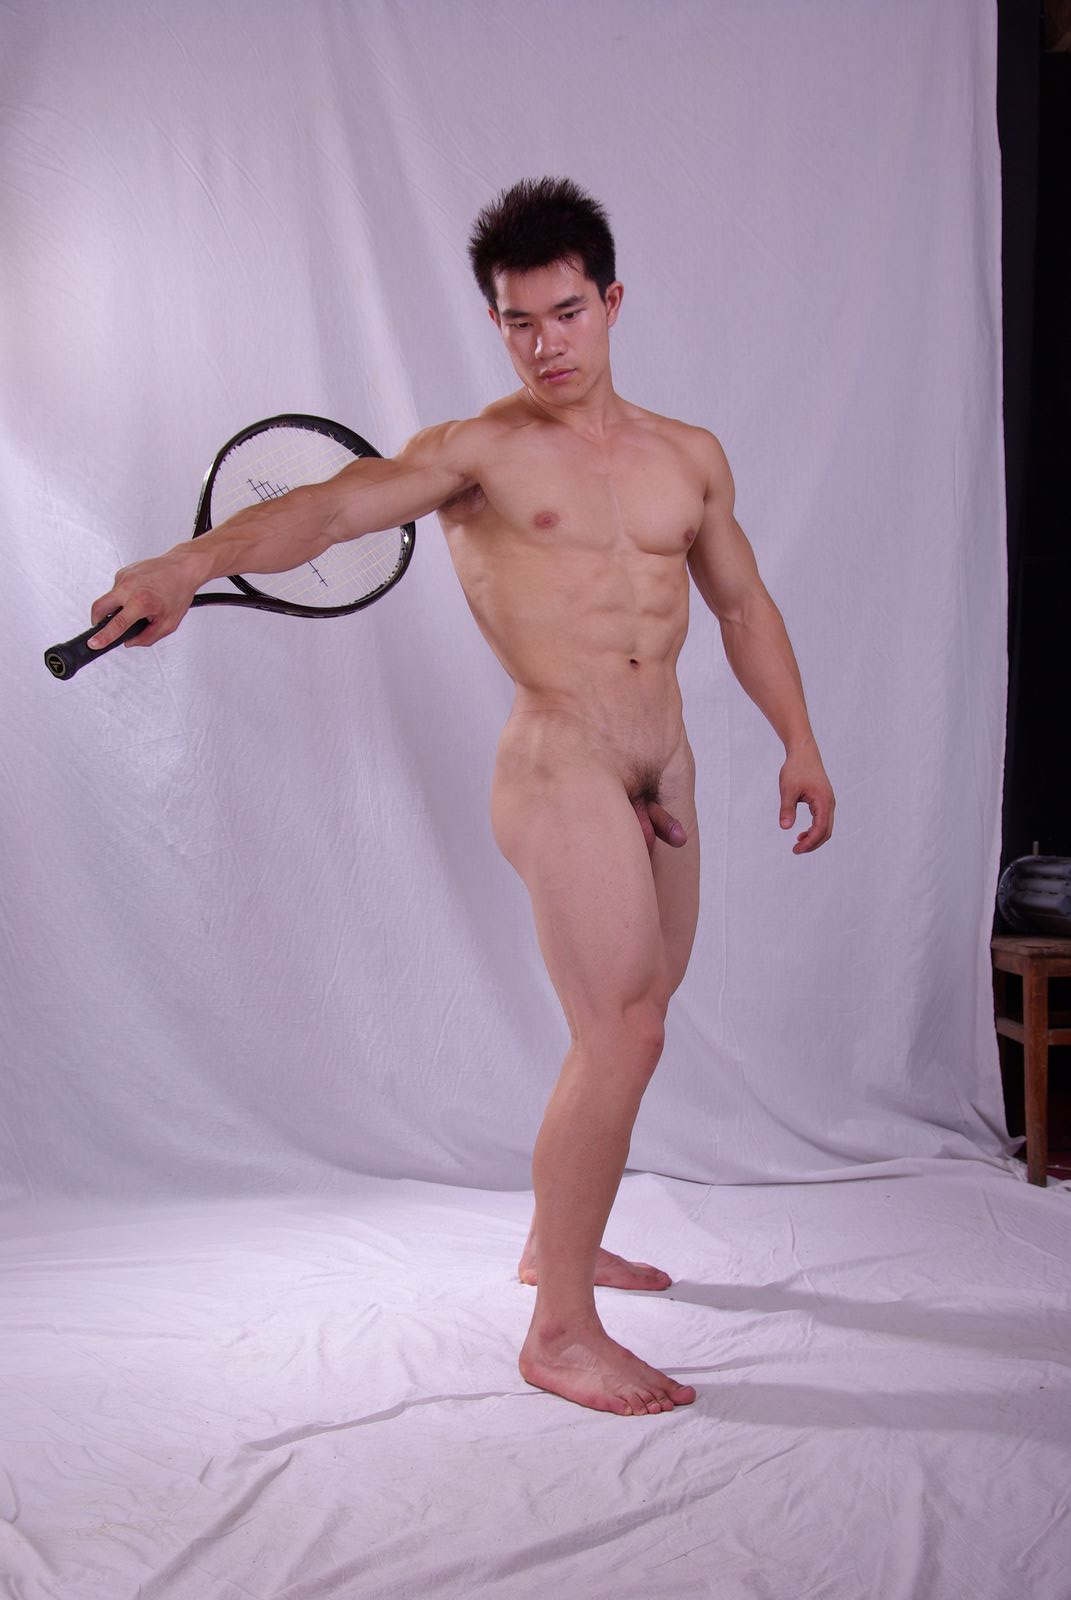 playgirl sex models videos